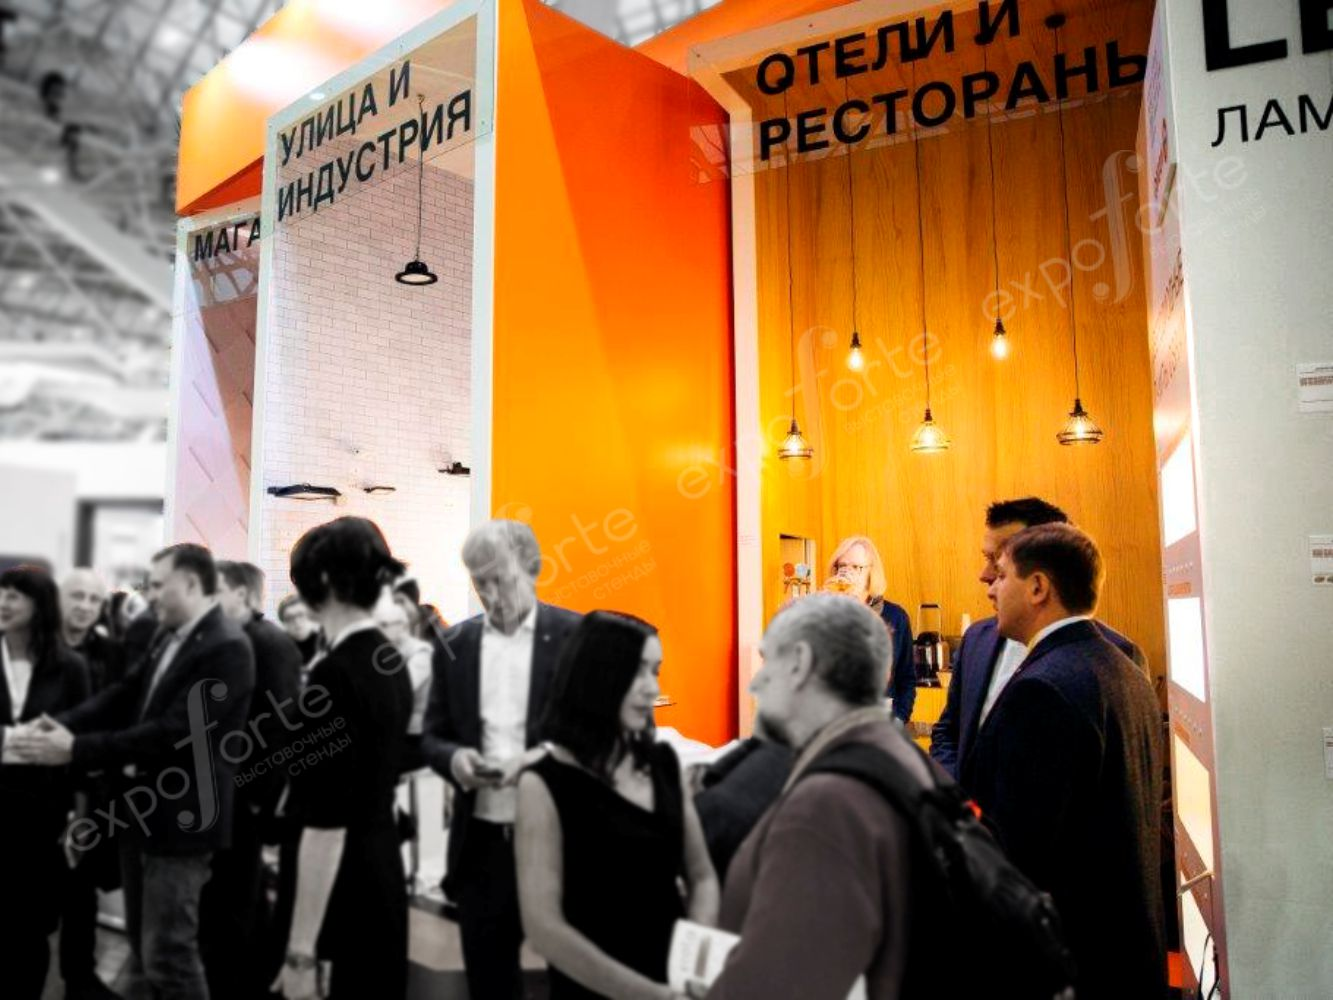 Фото: LEDVANCE, выставка INTERLIGHT – картинка 2